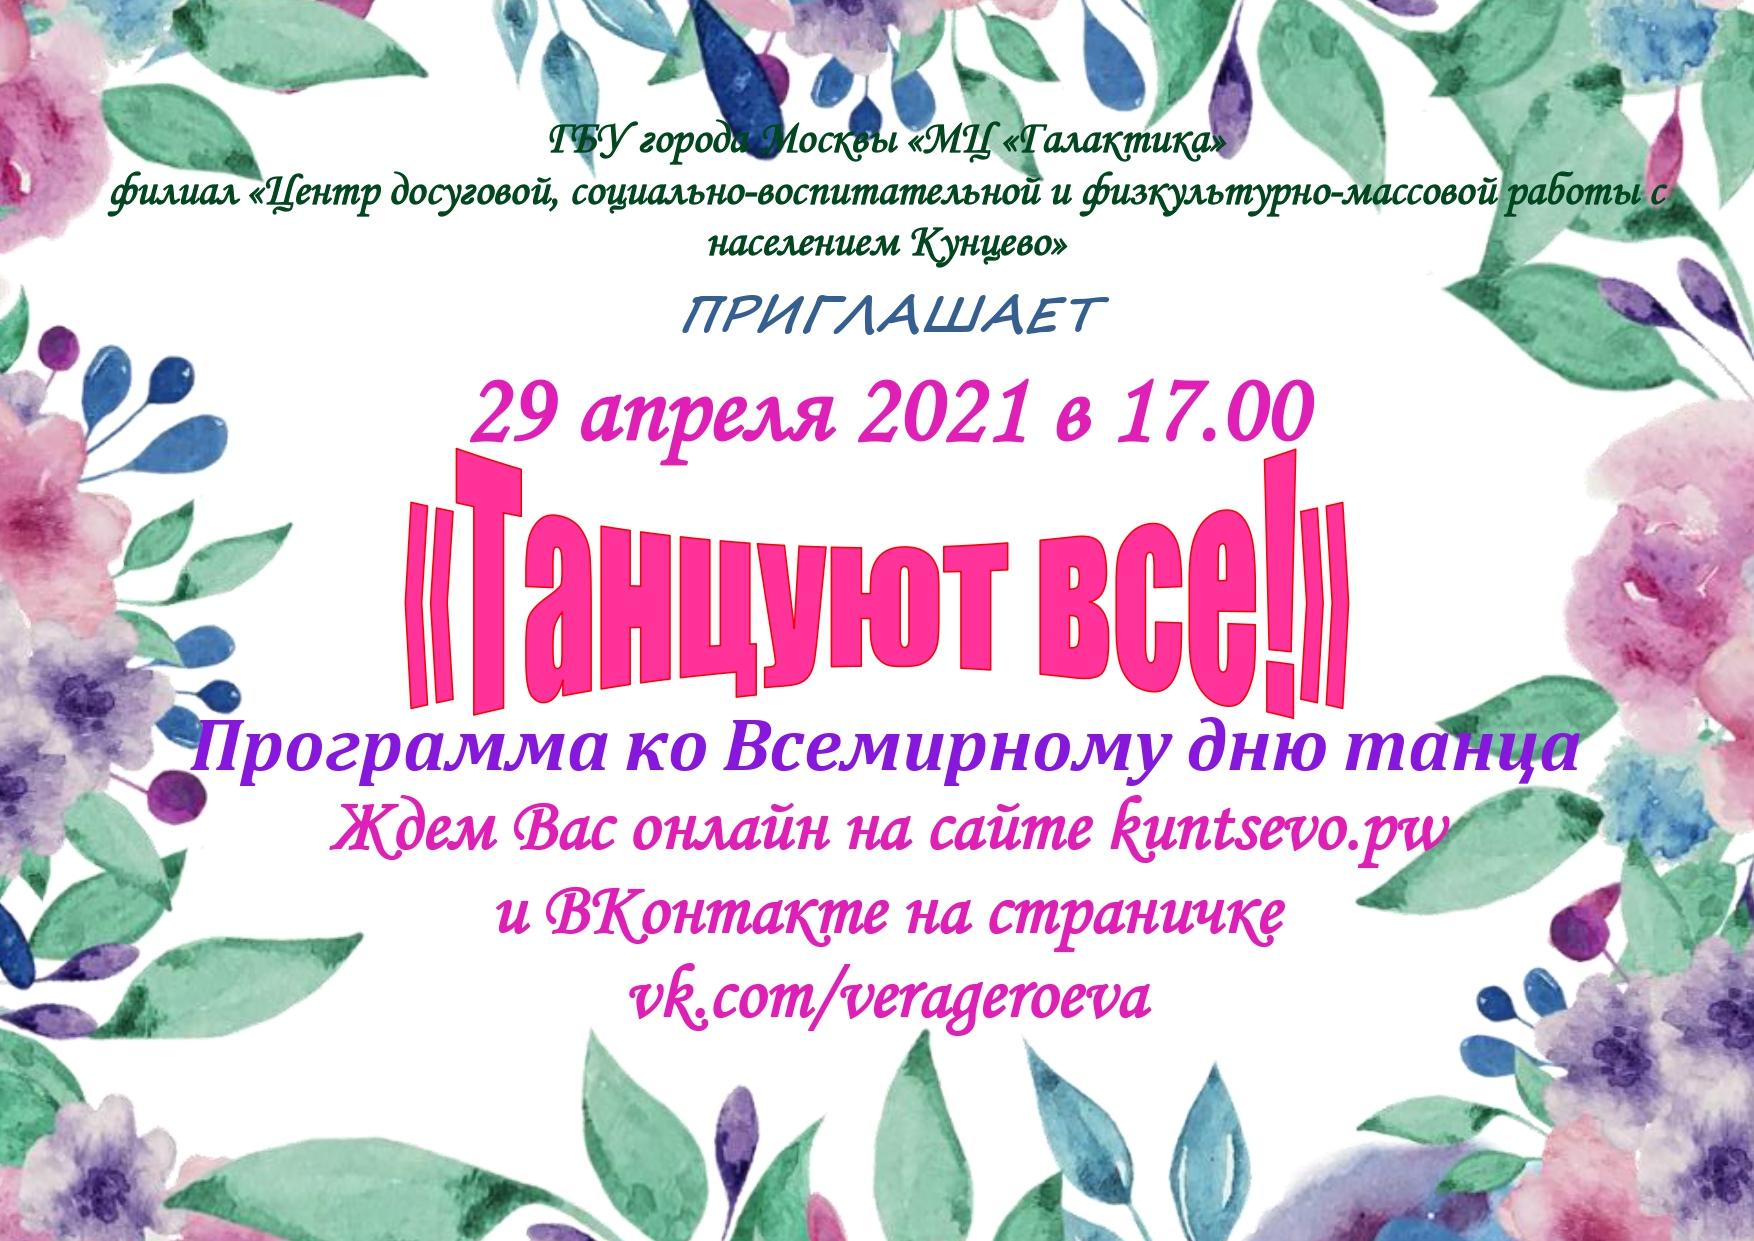 Онлайн концерт «Танцуют все!», посвященный Международному дню танца